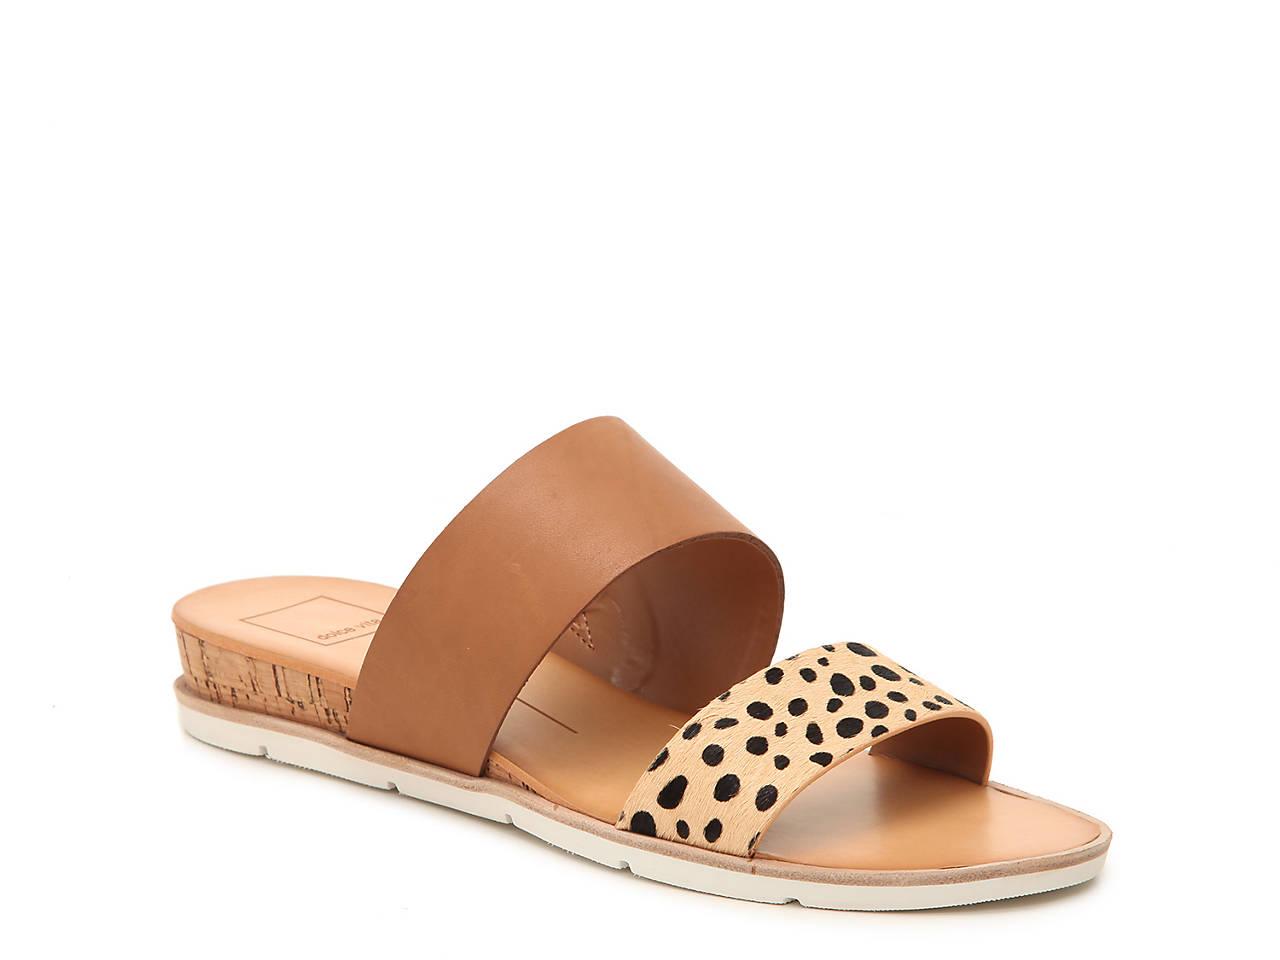 4845e1320ce Dolce Vita Vala Wedge Sandal Women s Shoes